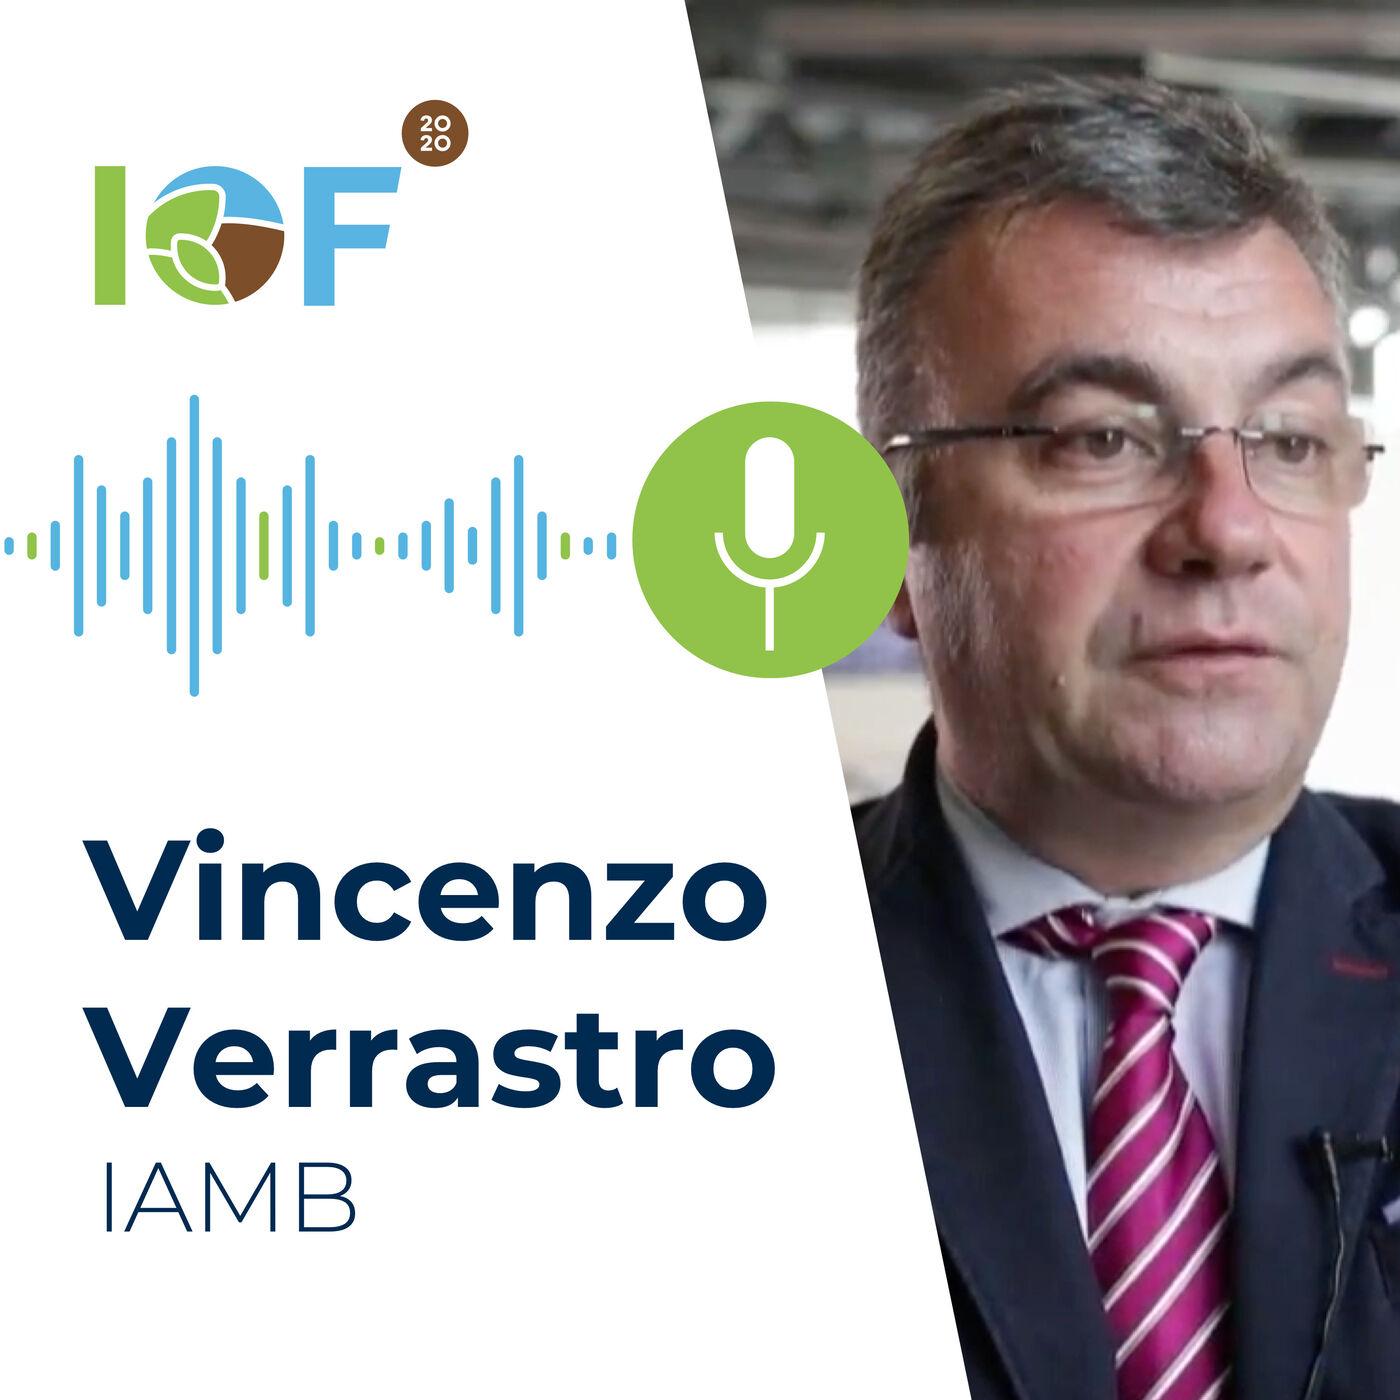 Interview Vincenzo Verrastro (IAMB) - Fruit Trial